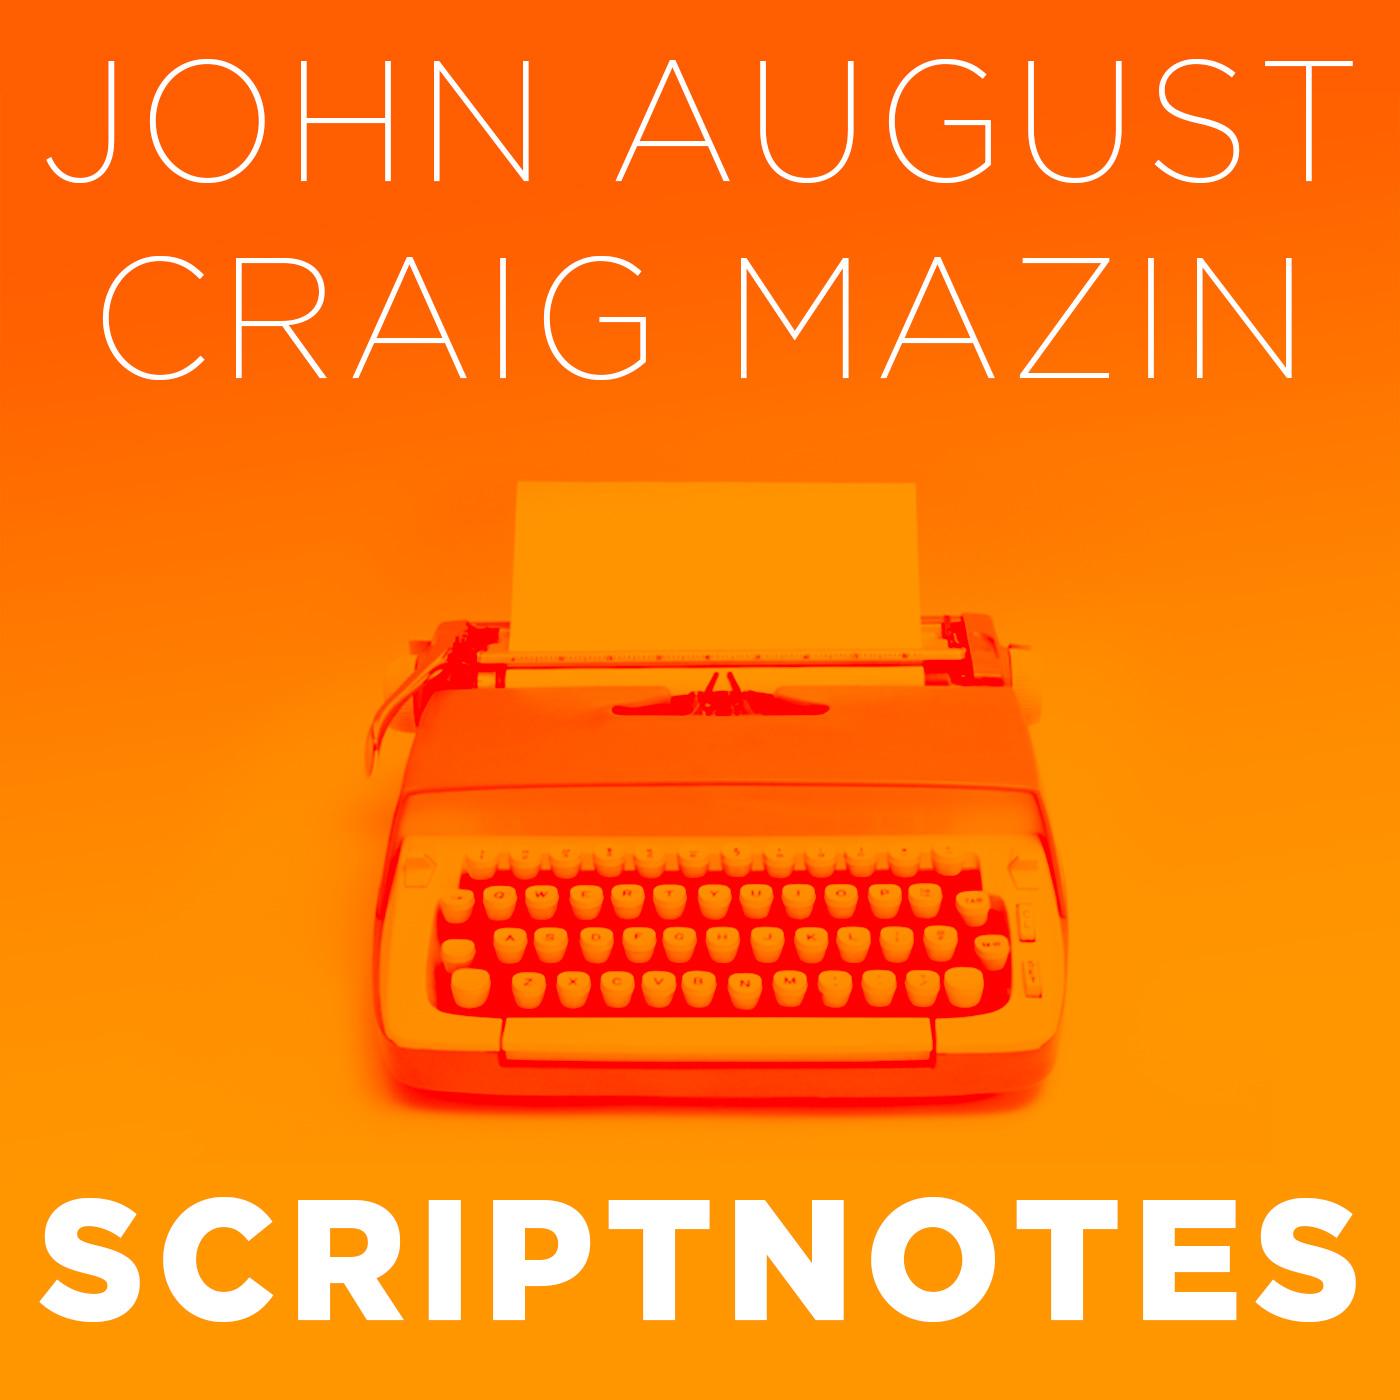 The John August school of screenwriting